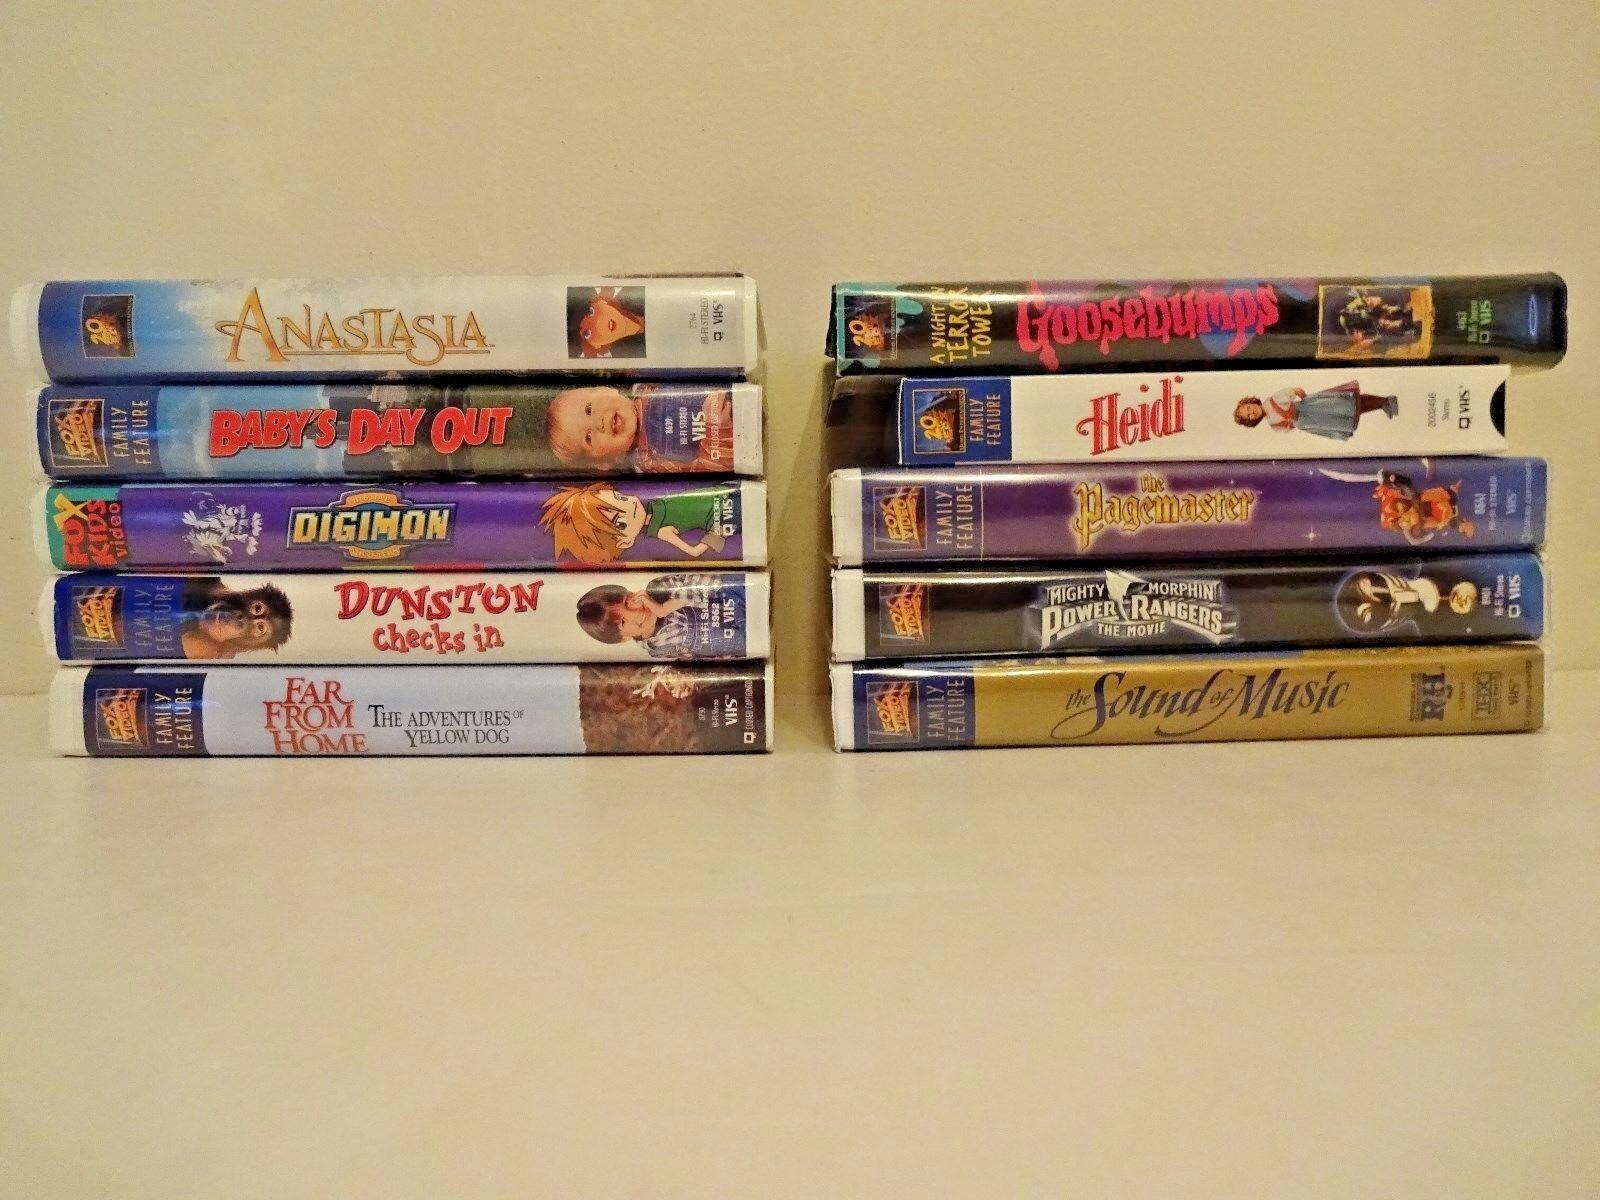 Walt Disney Warner Bros. Fox VHS Videos Movies You choose Pick 8 for $15